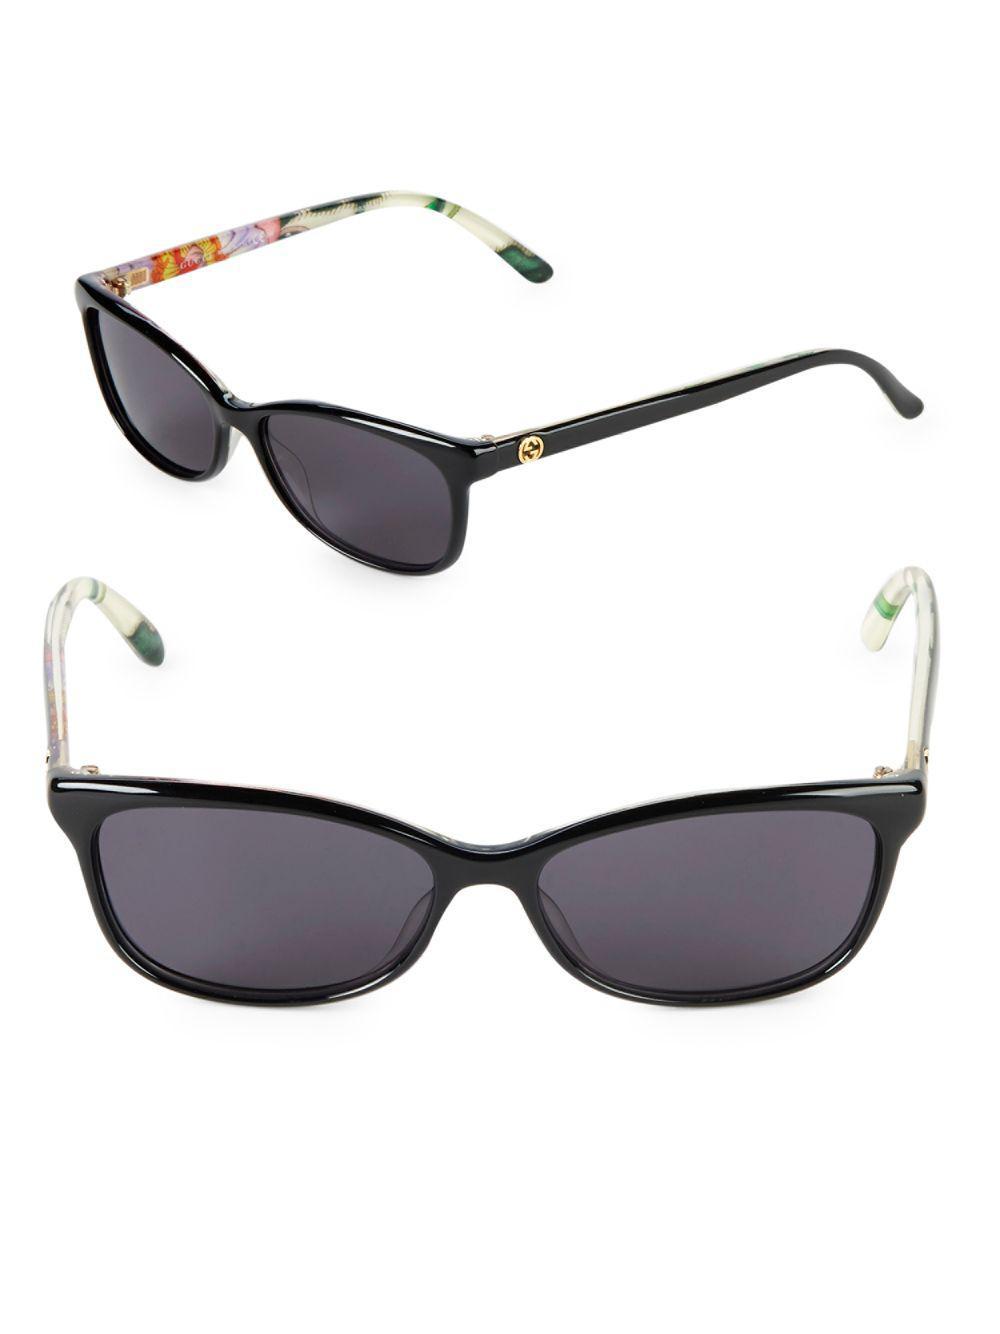 dcbb116a70d0b Lyst - Gucci 54mm Rectangle Sunglasses